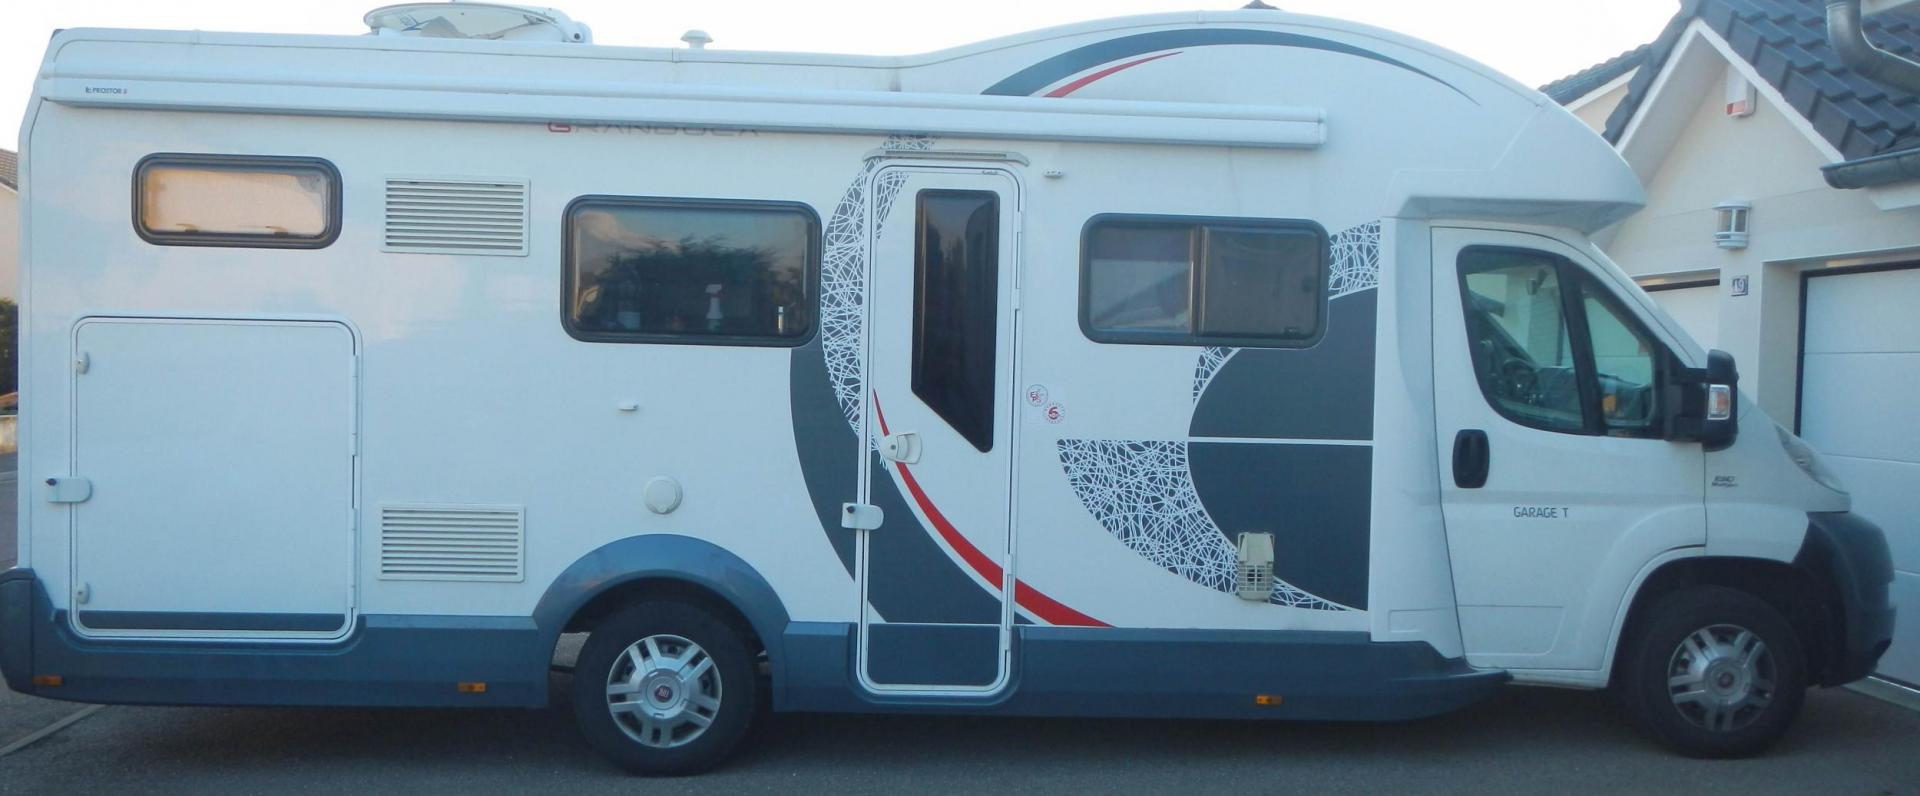 camping-car ROLLERTEAM GRANDUCA TL